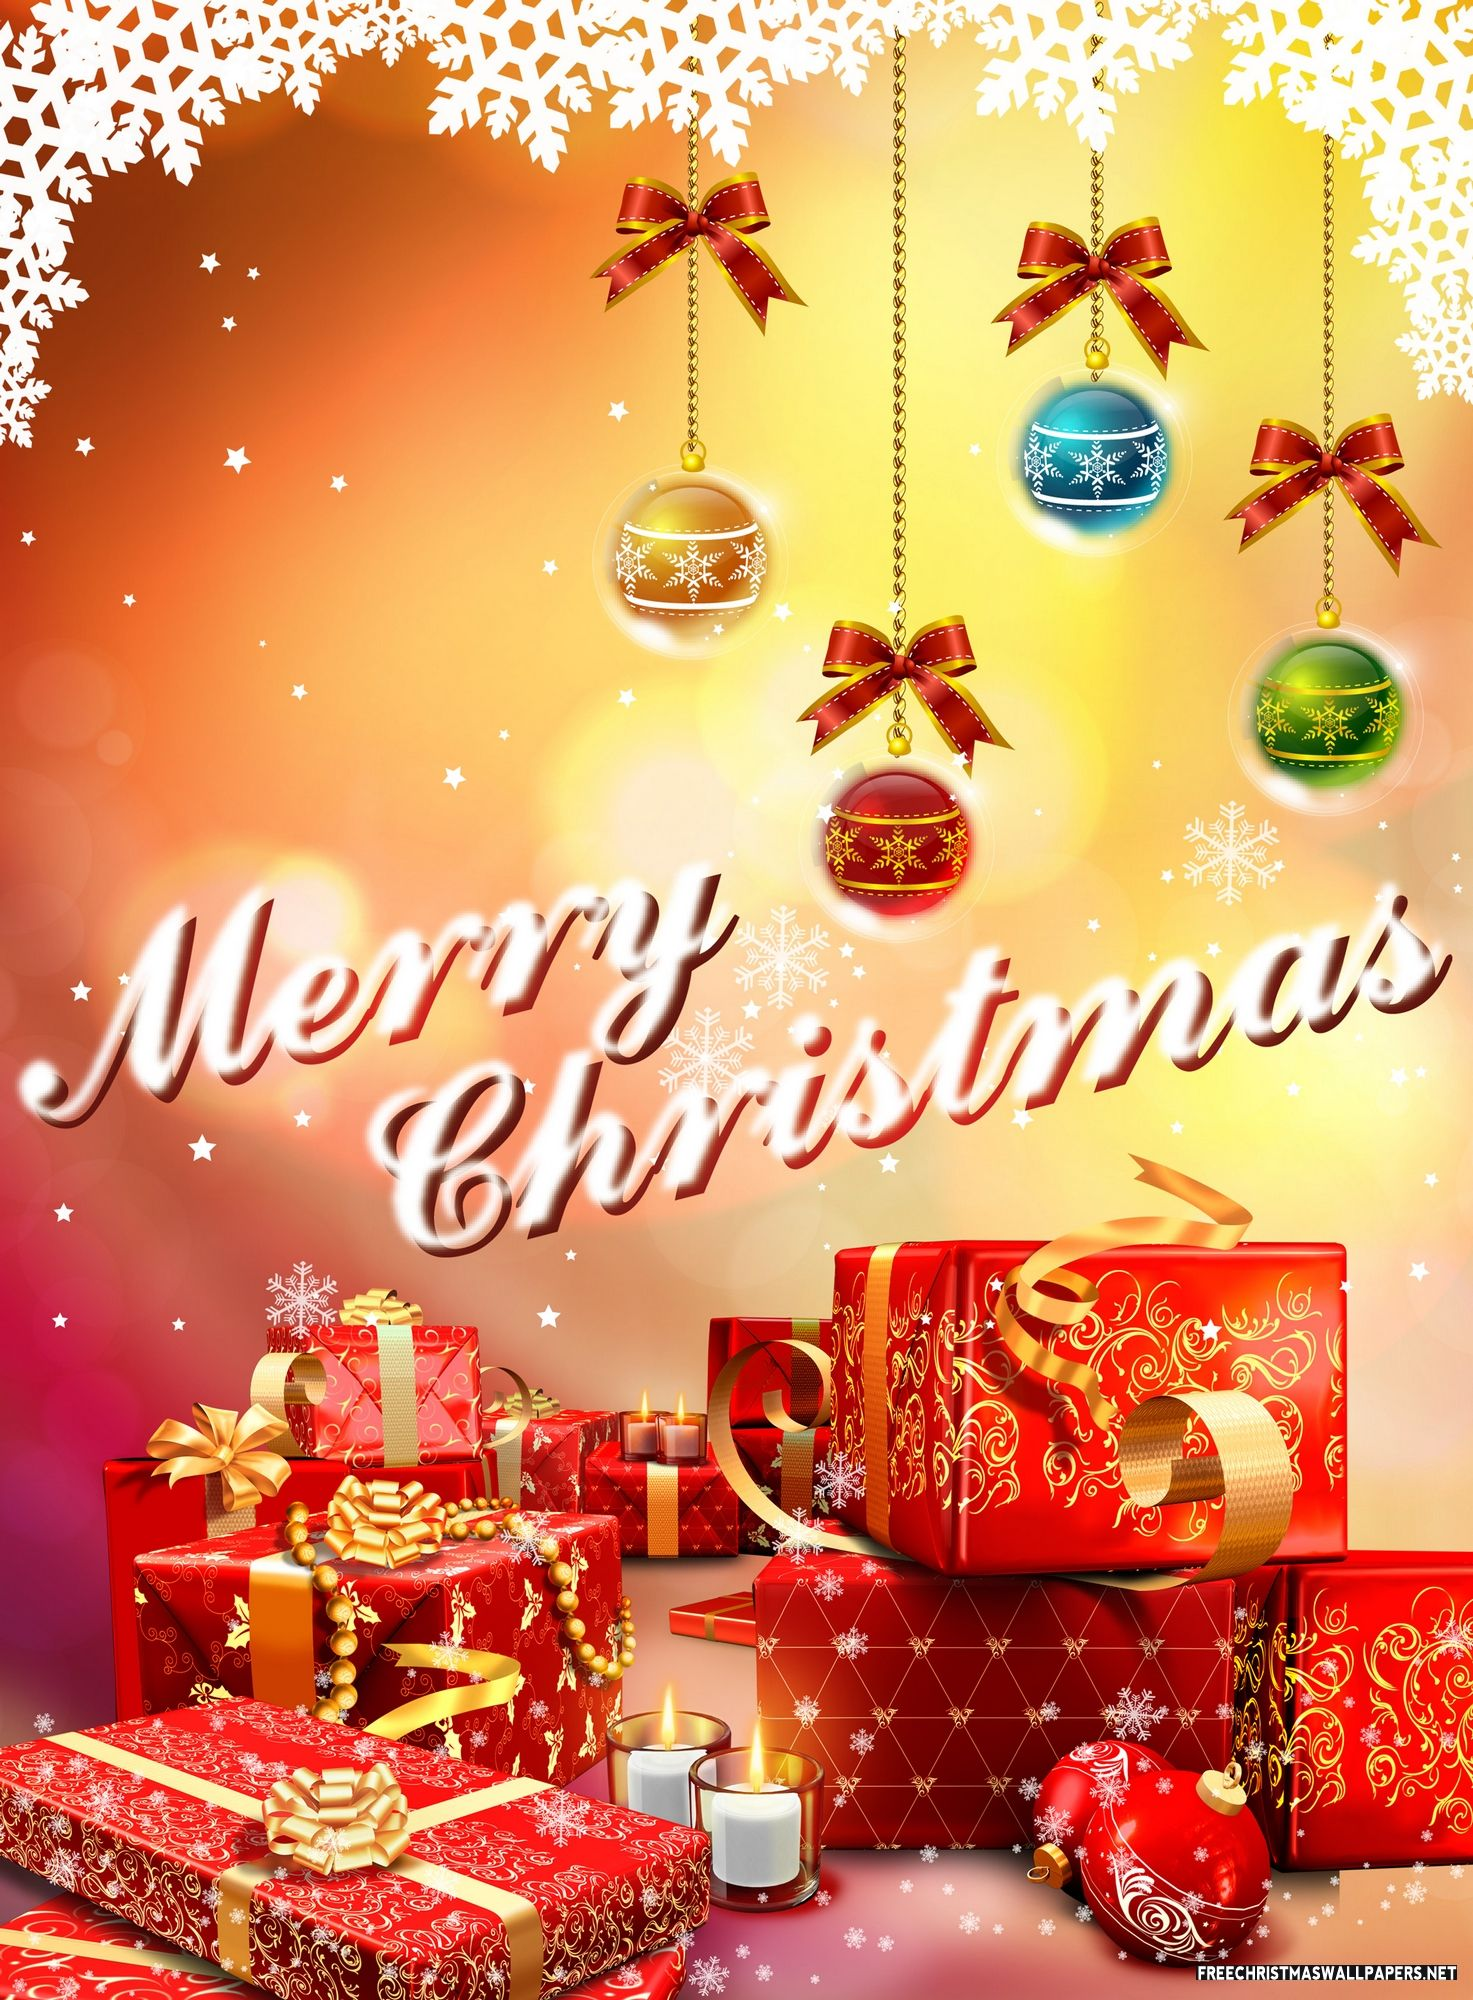 Imprinted Christmas Cards | Xmas Cards | Pinterest | Christmas ...